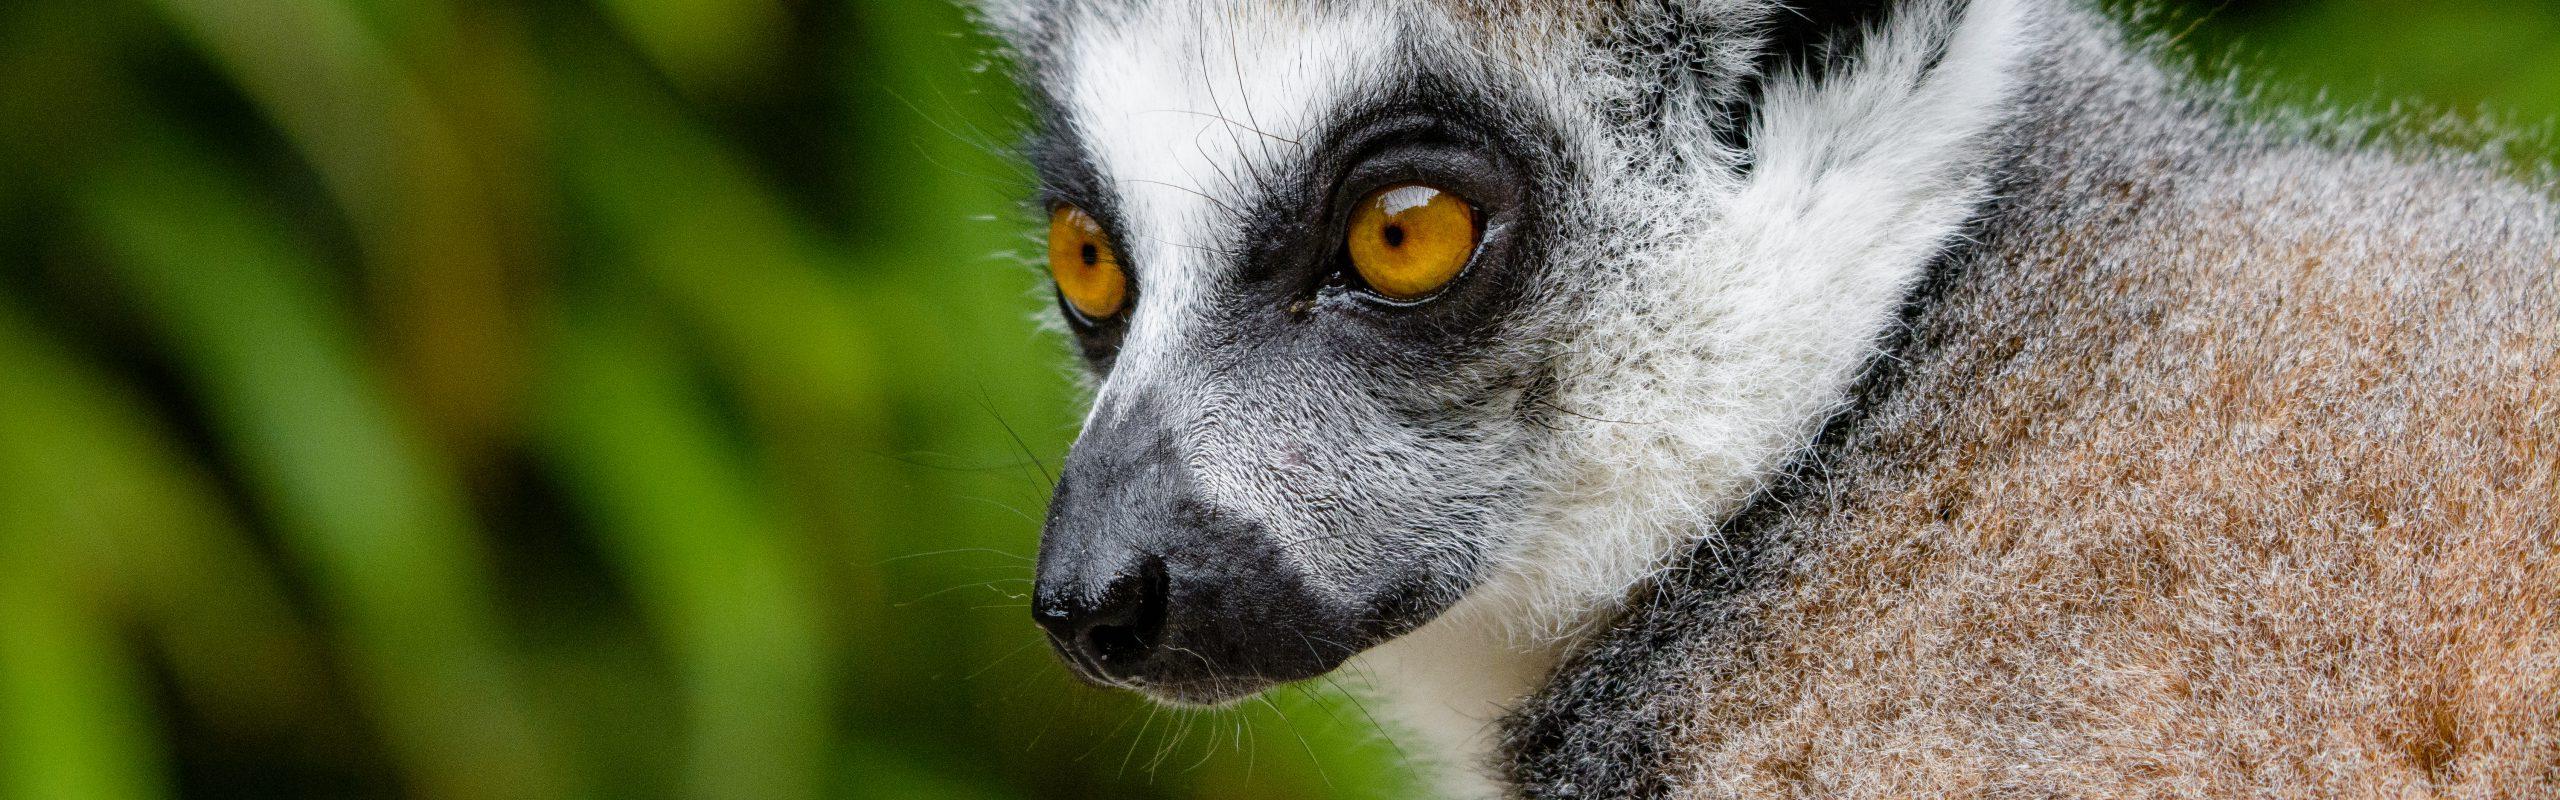 https://faunafocus.com/home/november-2018-ring-tailed-lemur/#jp-carousel-11929